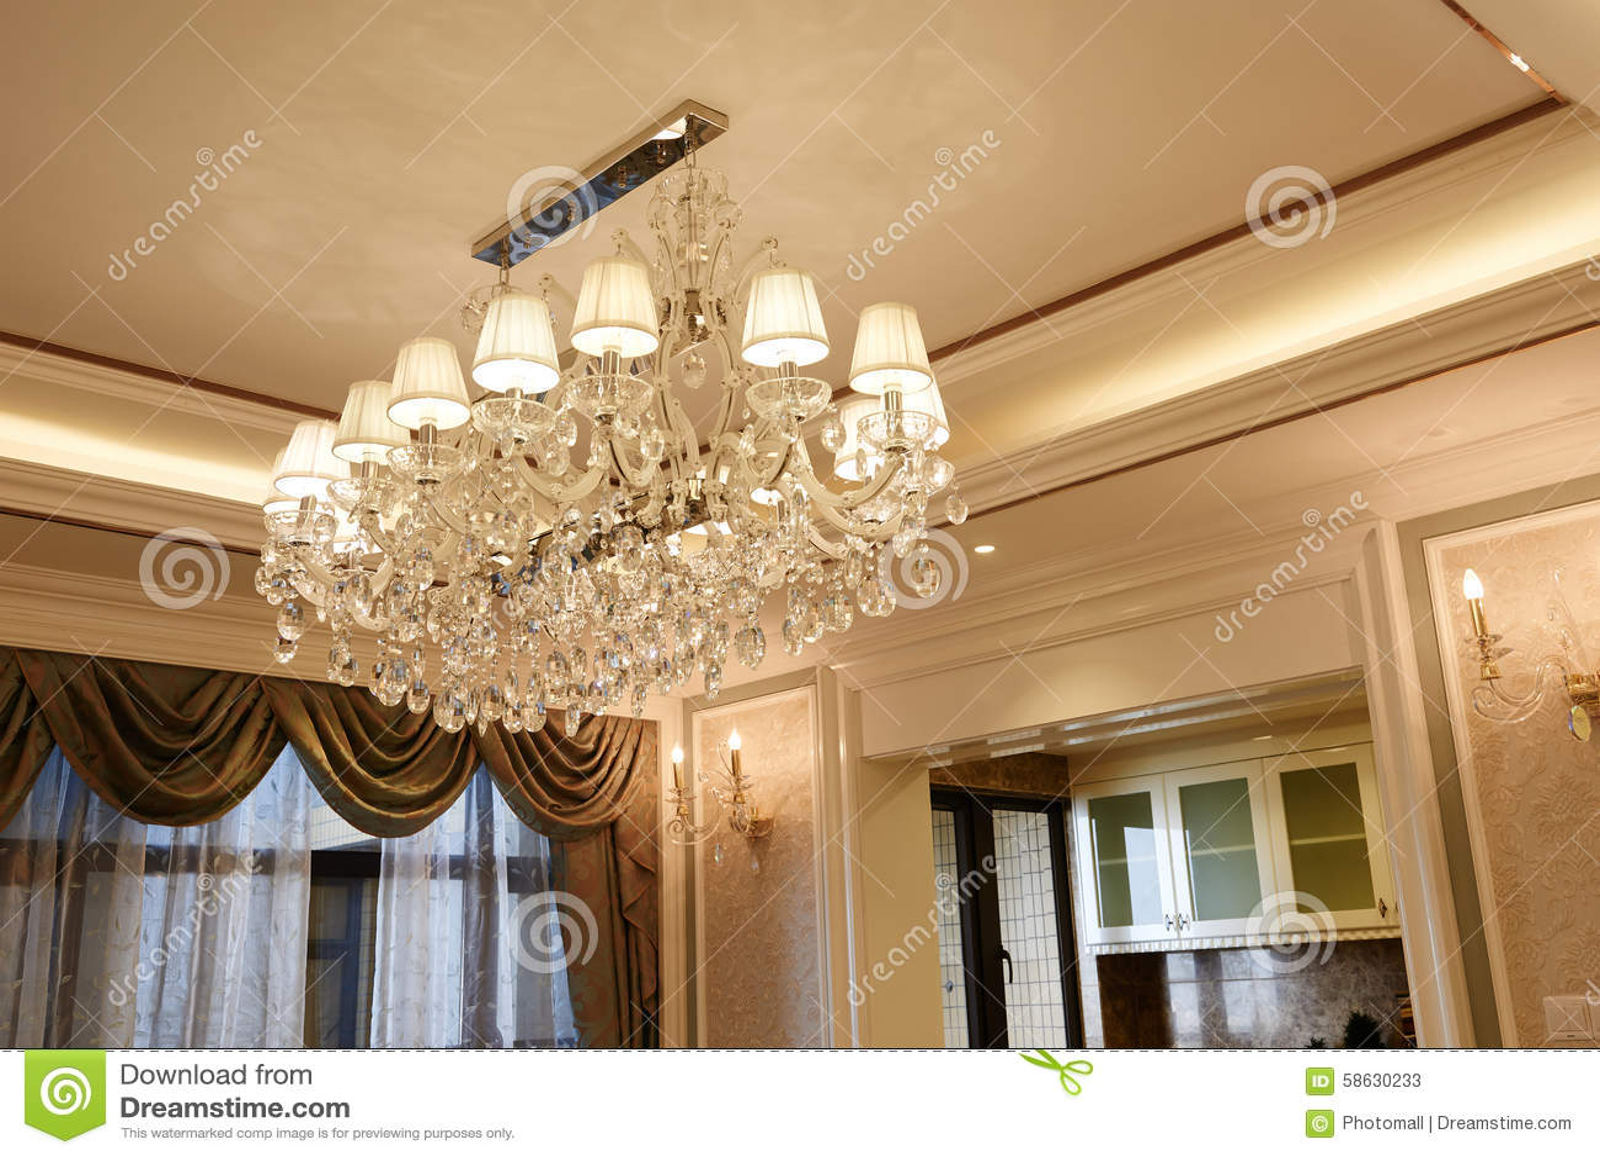 Lyxig Crystal Belysning I Vardagsrum Arkivfoto - Bild: 58630233